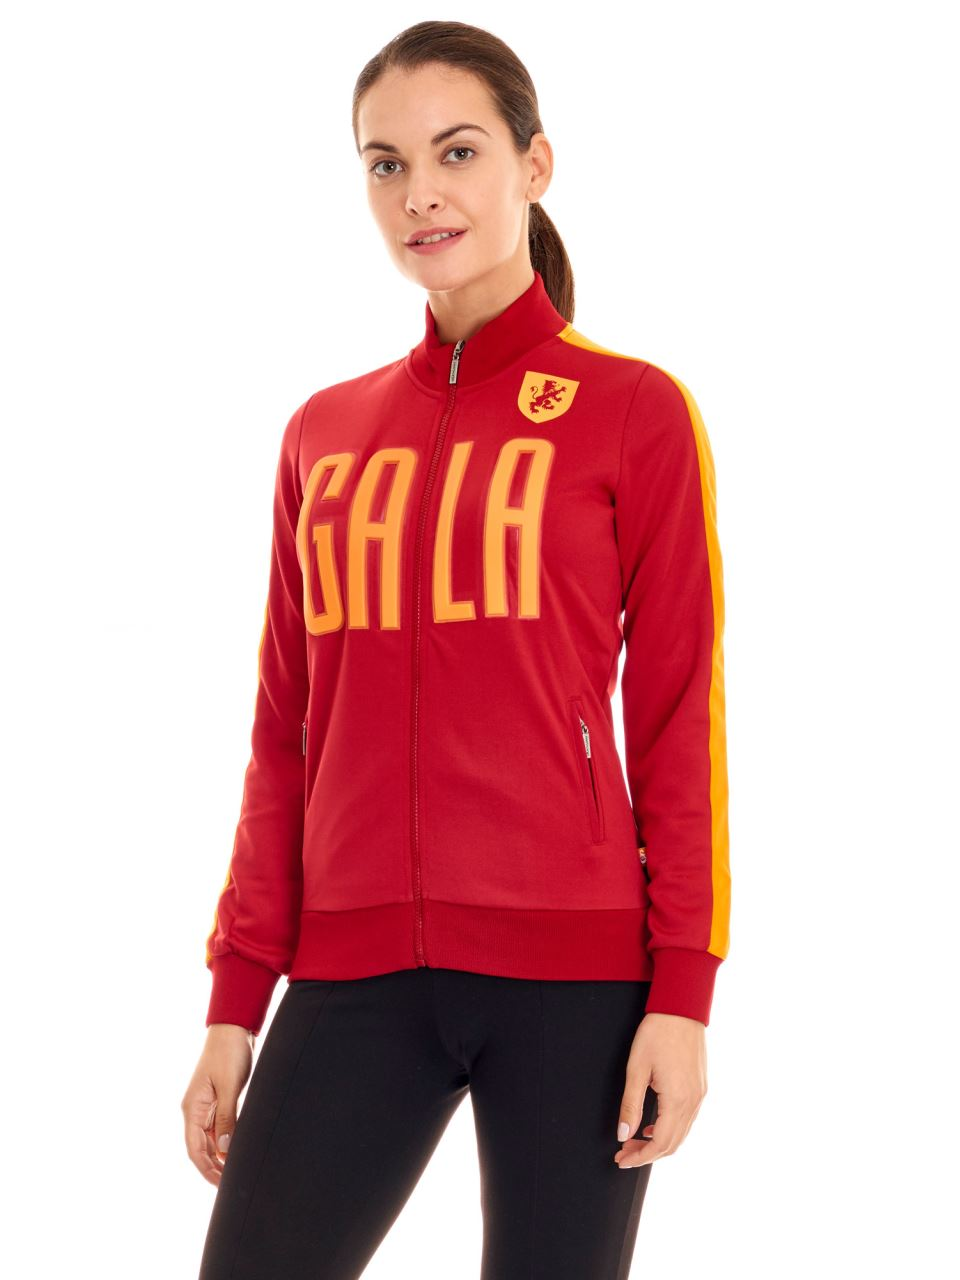 Gala Kadin Sweatshirt K191146